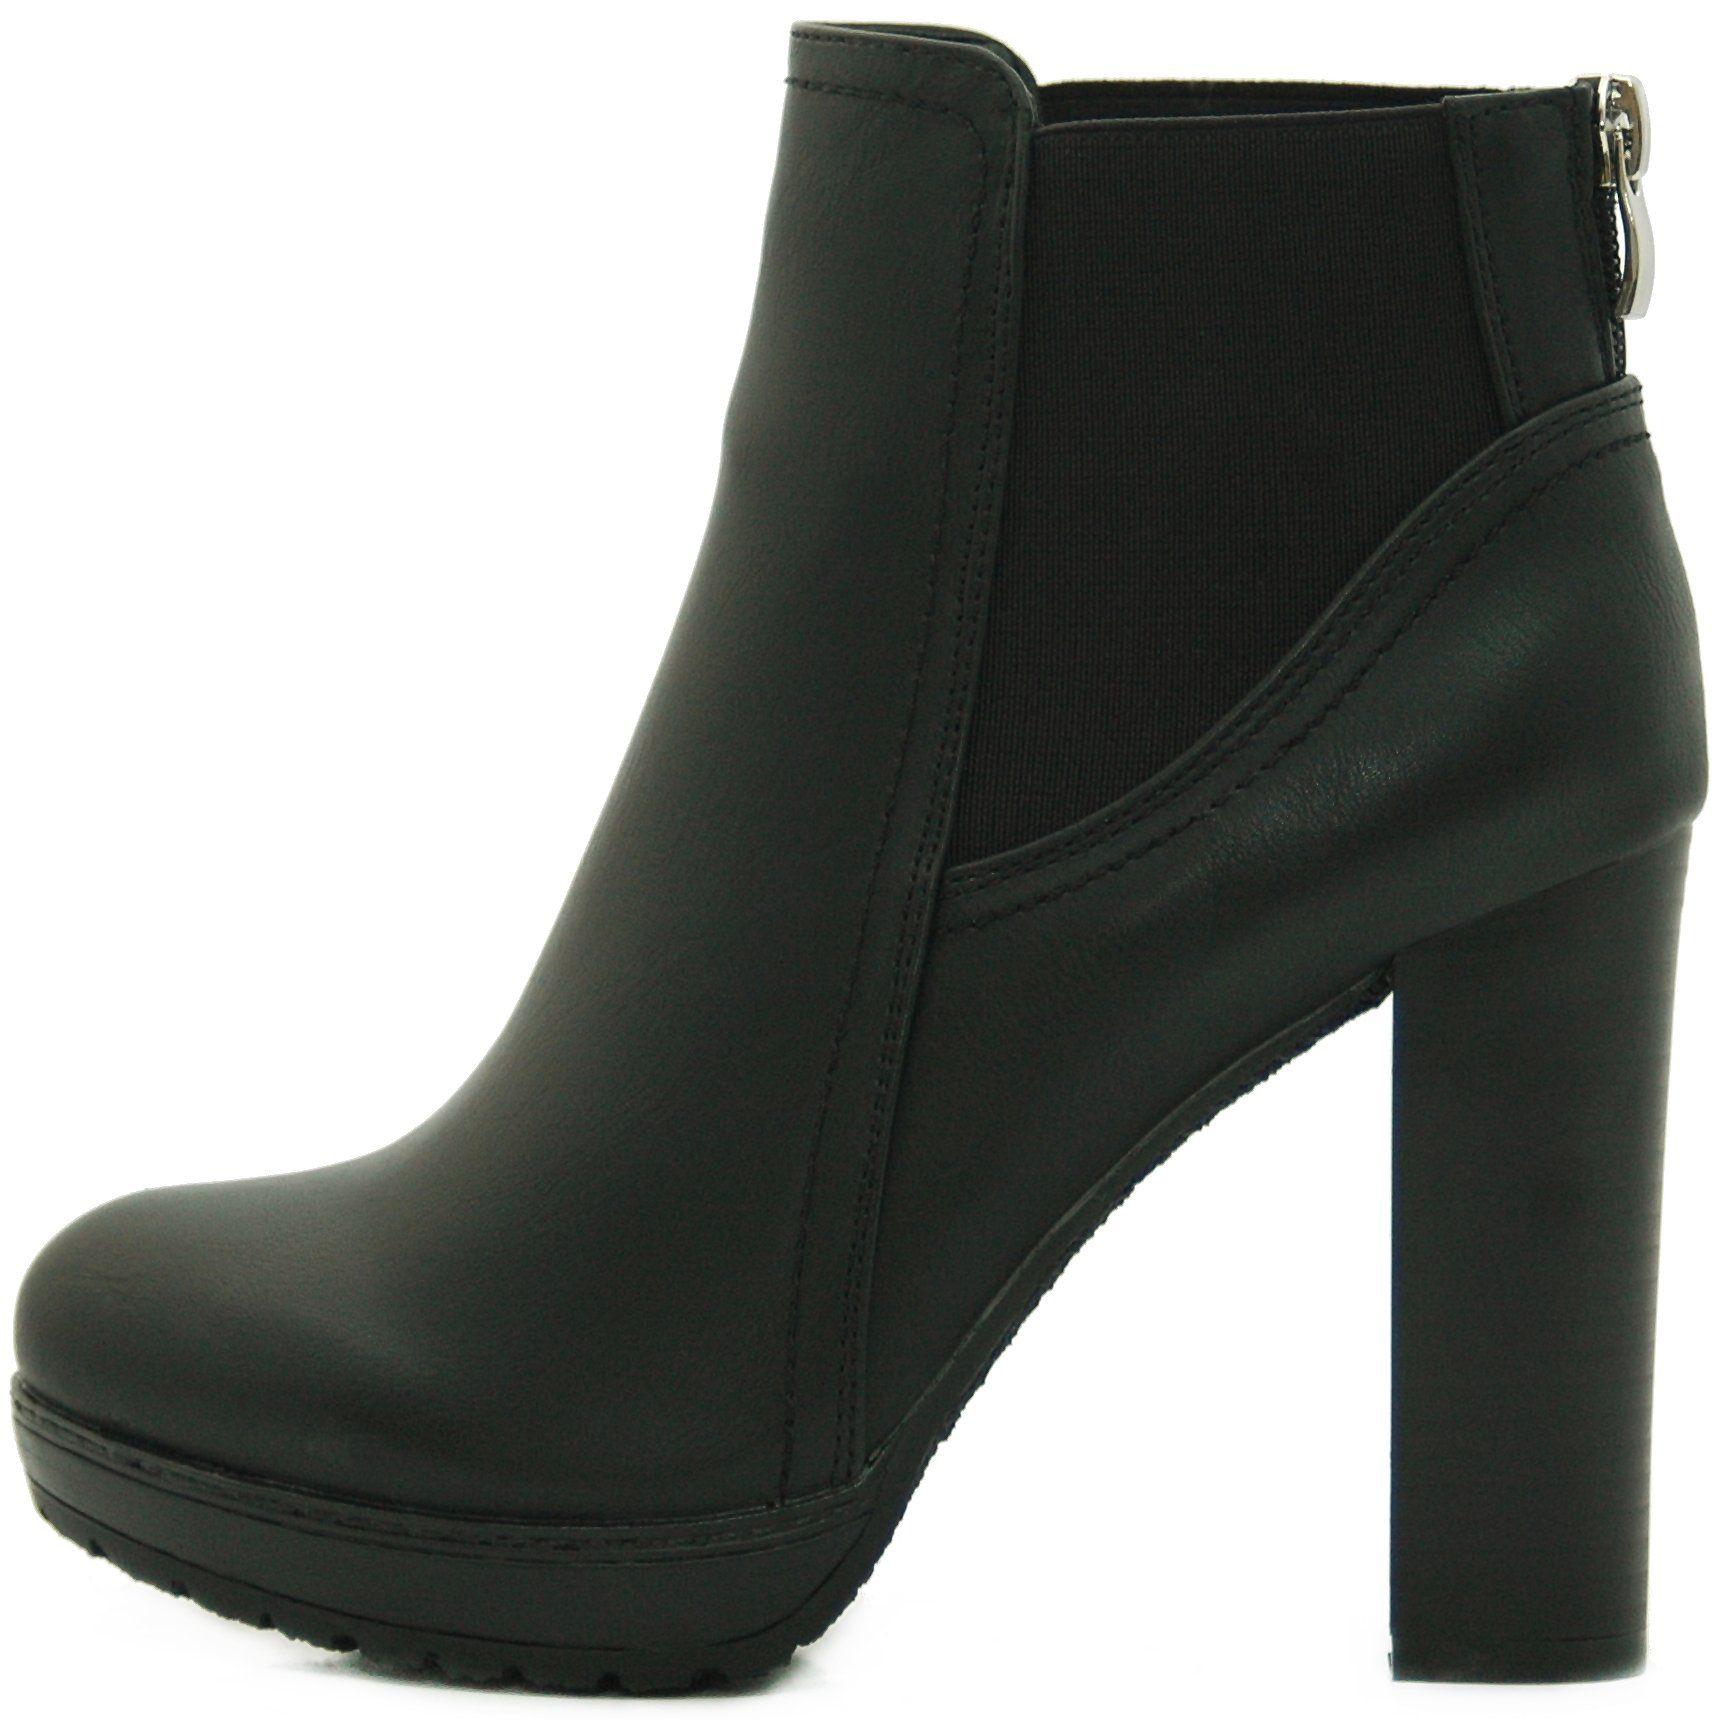 Kayla Shoes Chelsea Boots Plateau Stiefeletten mit